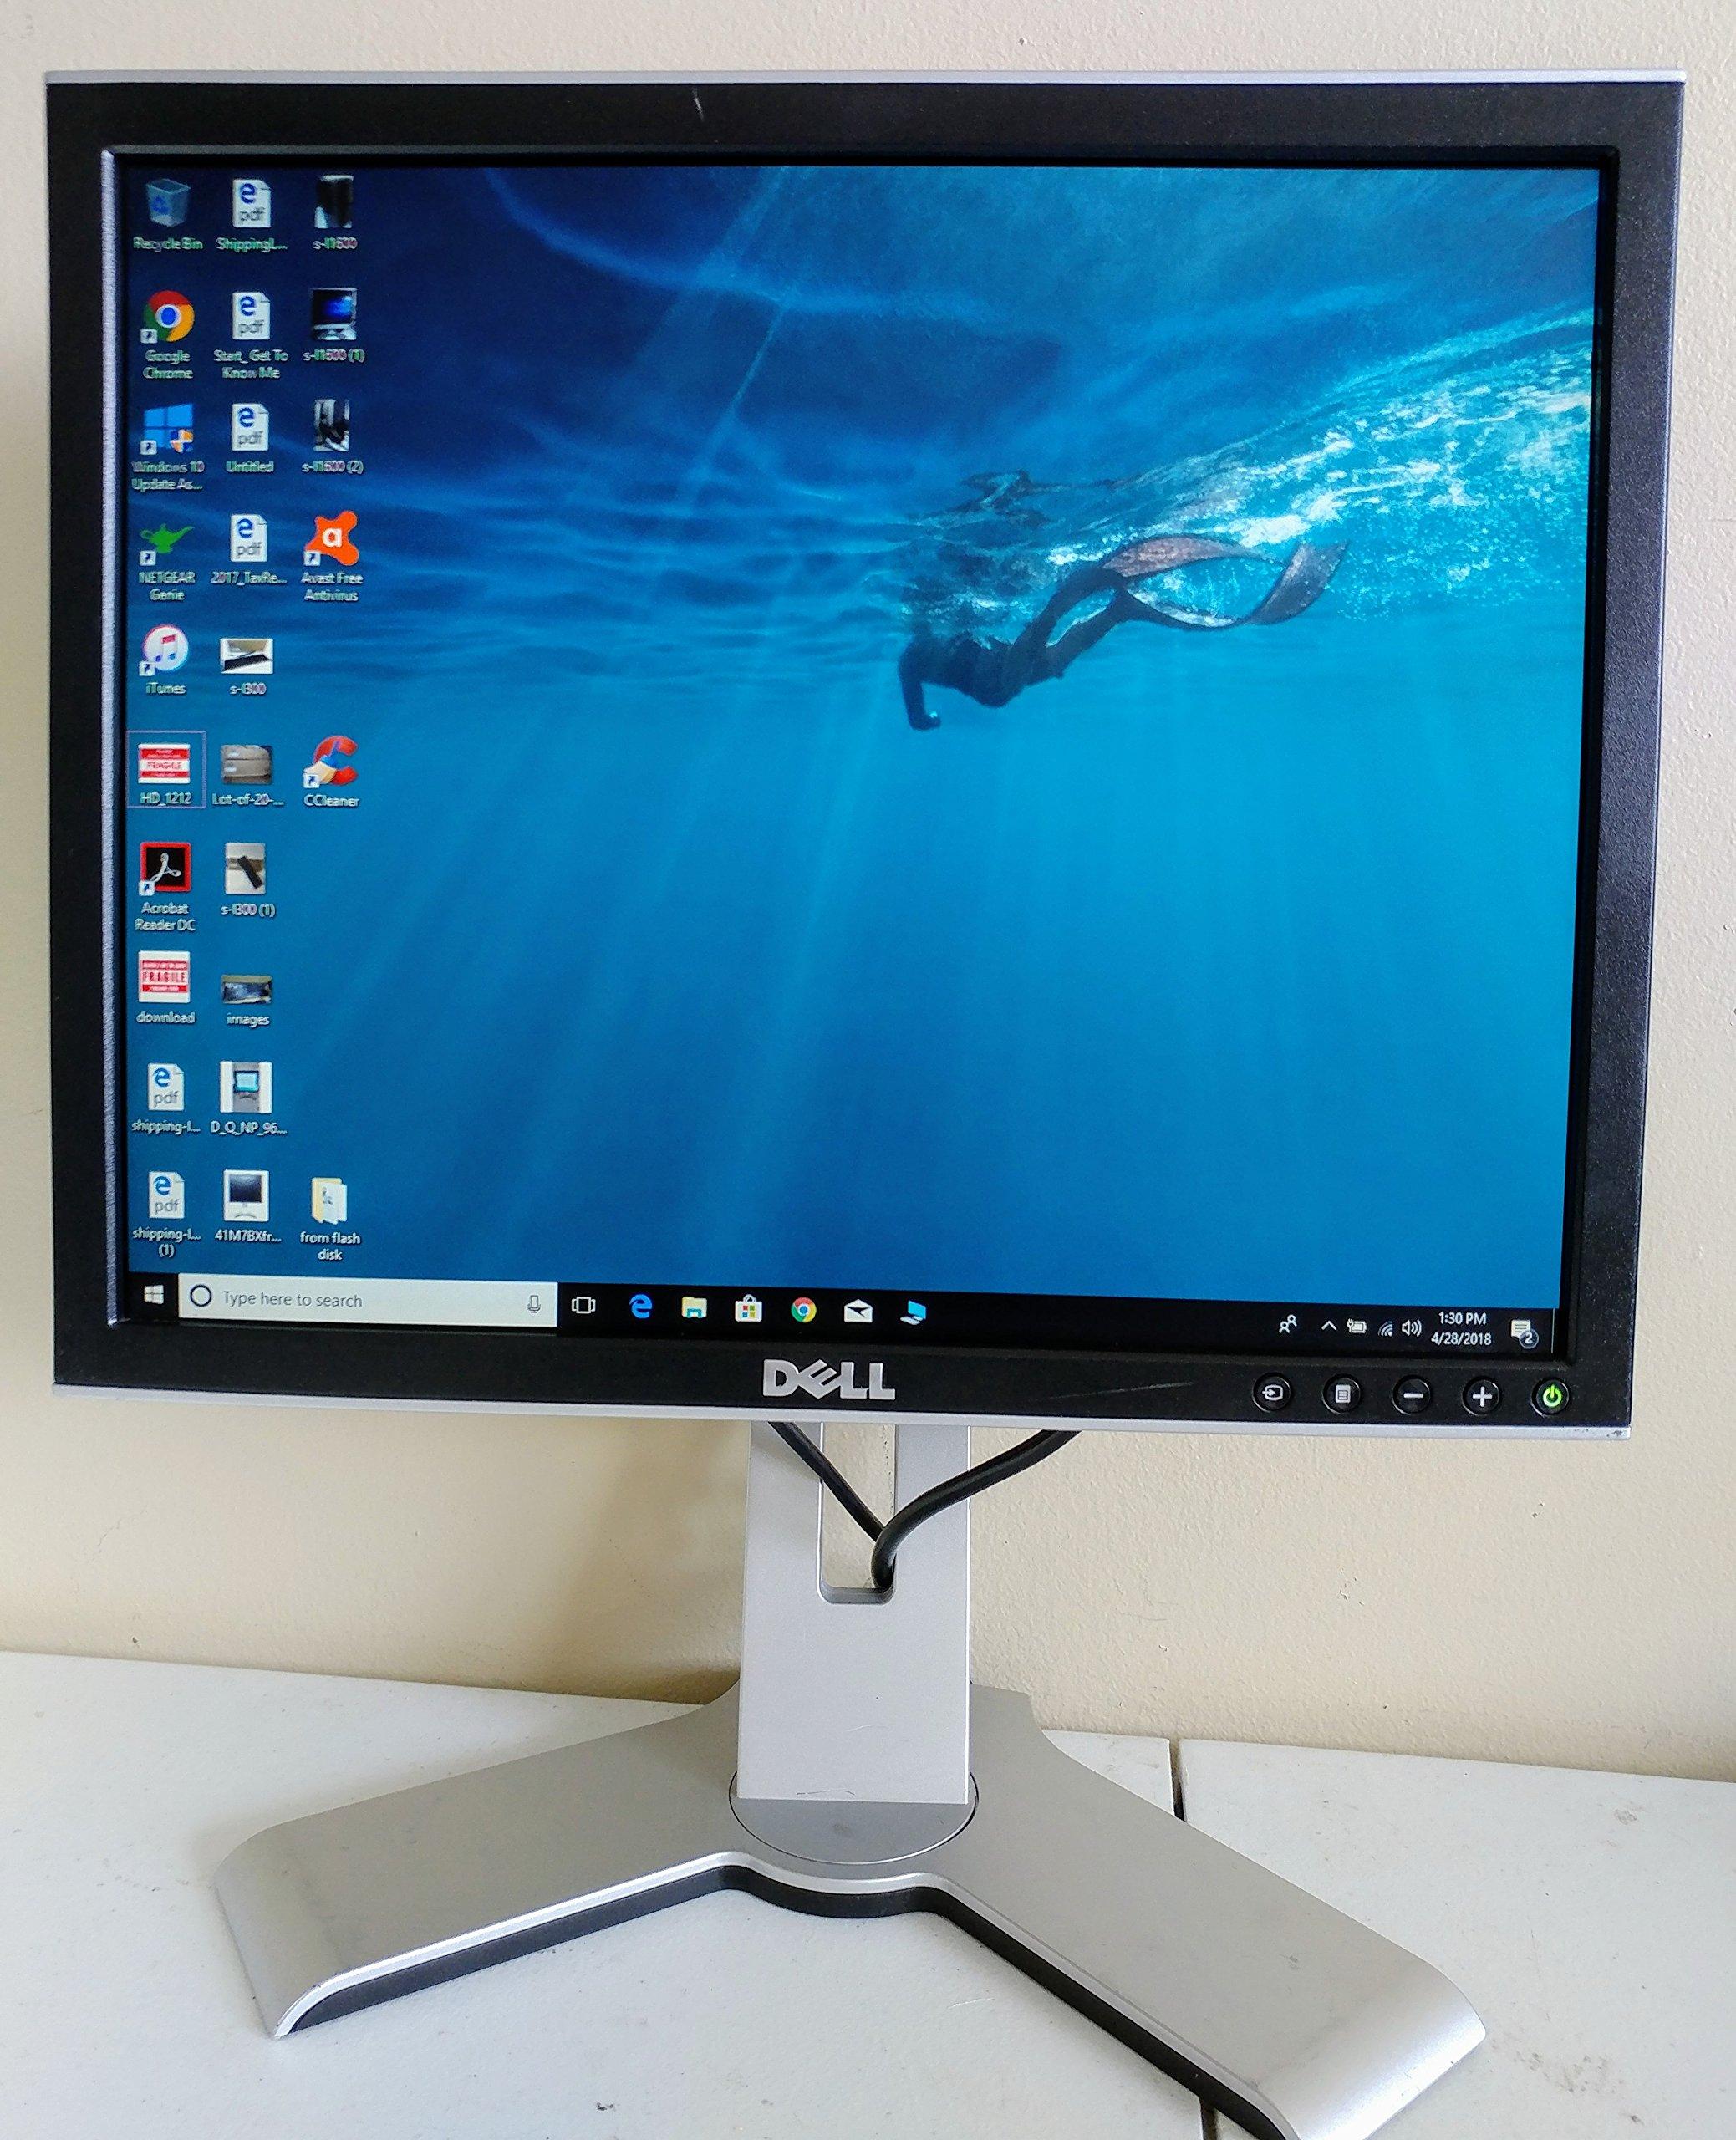 "17"" Dell 1708FPb DVI Rotating LCD Monitor w/USB Hub (Silver/Black) - Rotates to Portrait or Landscape View!"